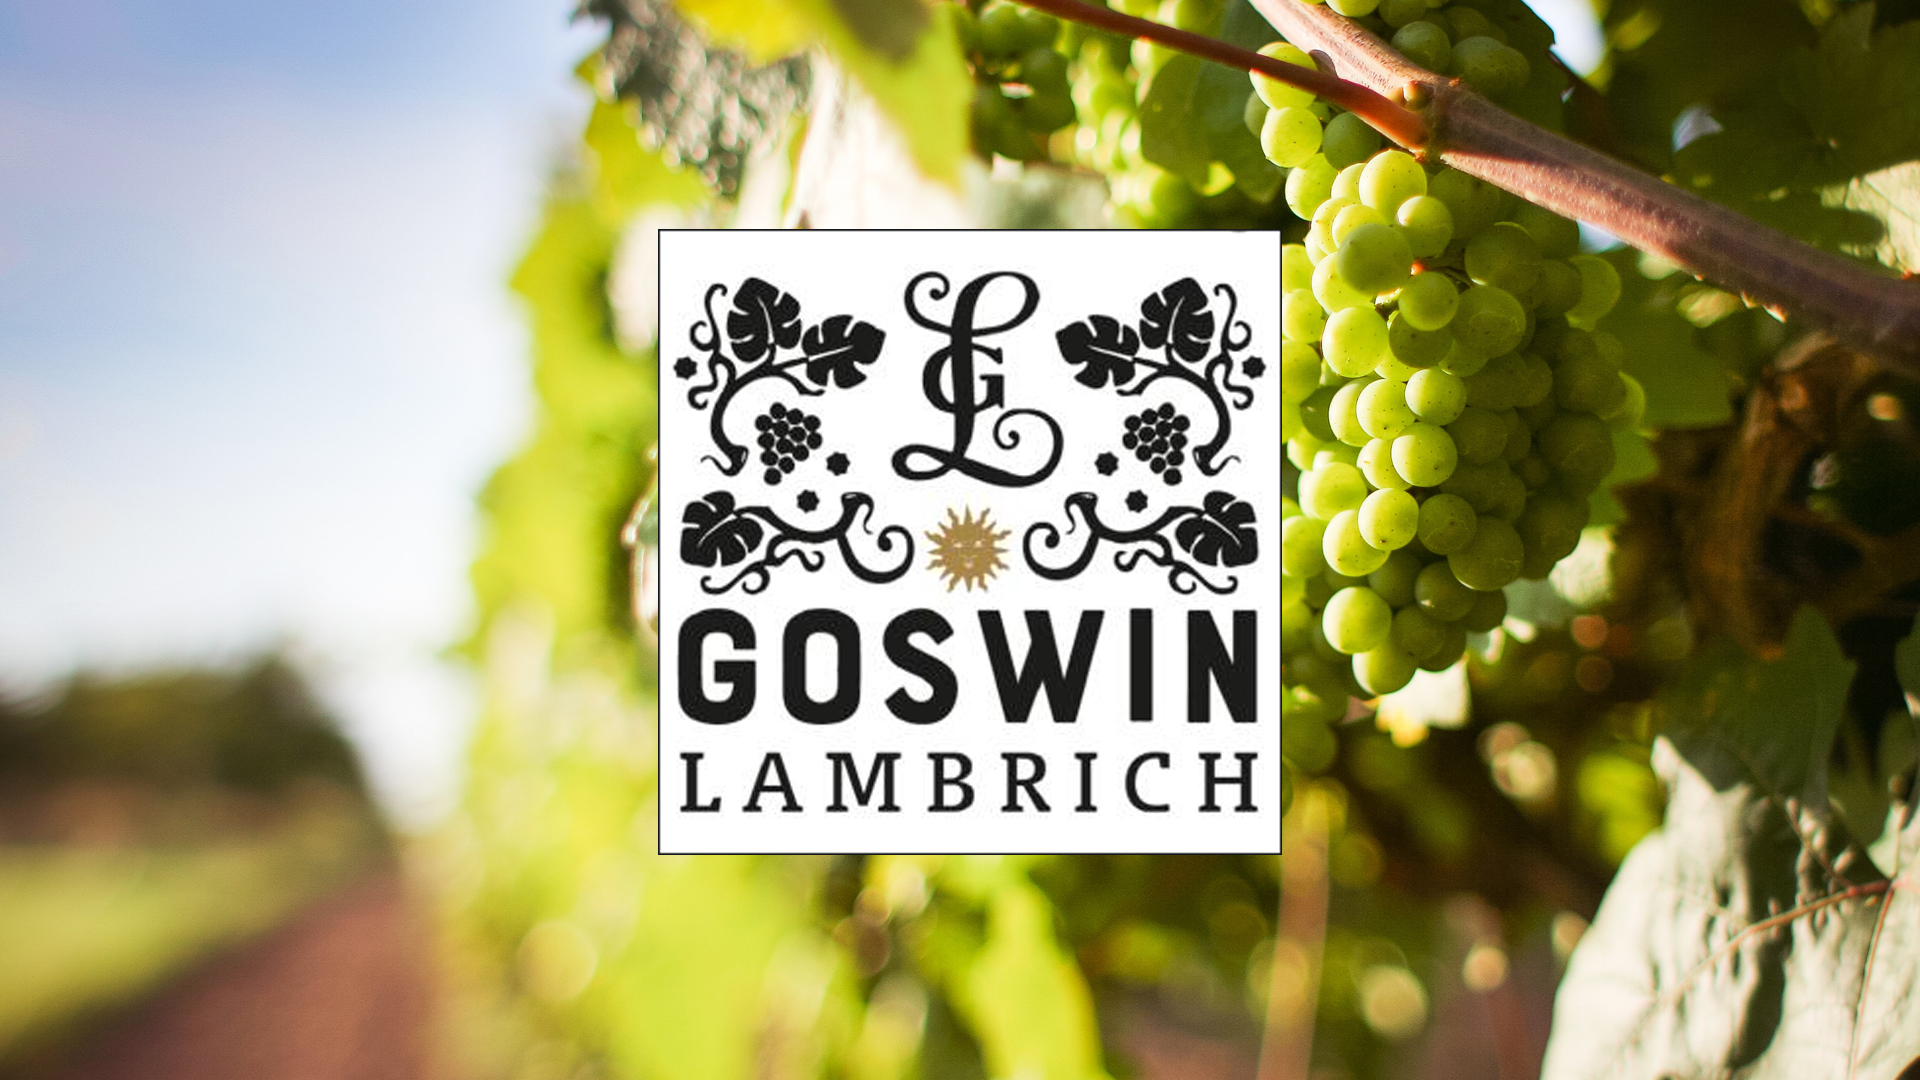 Gerhard Lambrich – Goswin Lambrich wine and sparkling wine estate